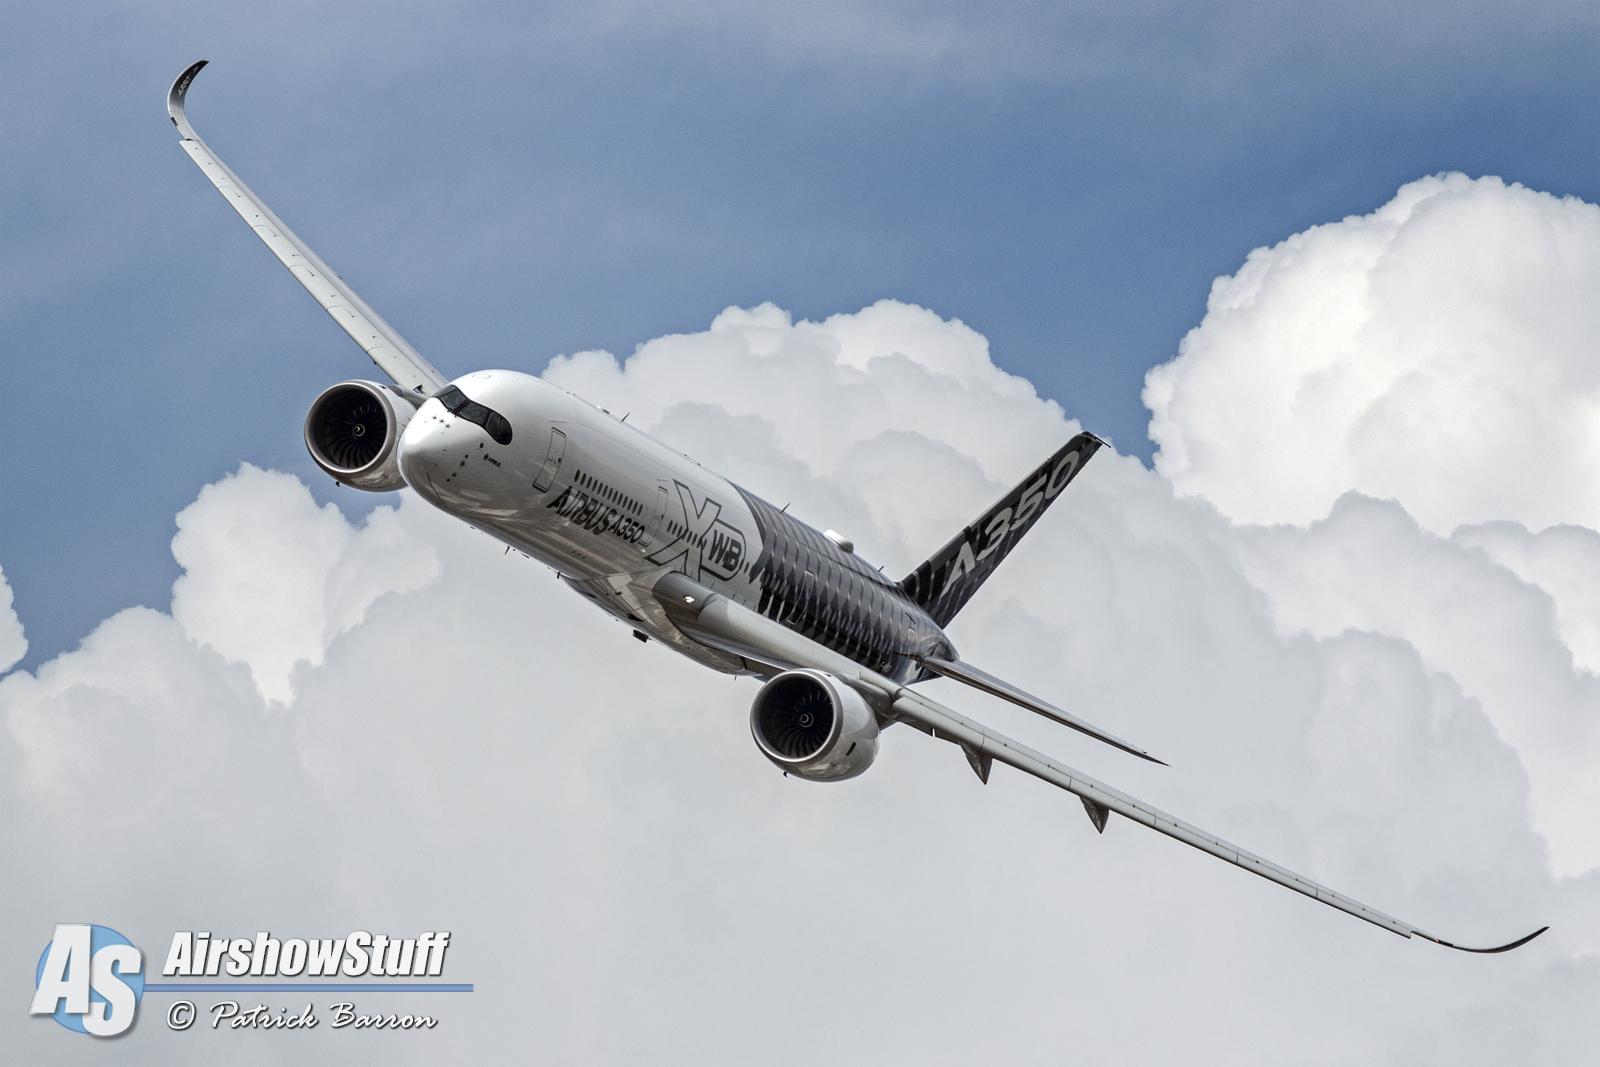 EAA Airventure Oshkosh 2015 - A350 XWB - Patrick Barron